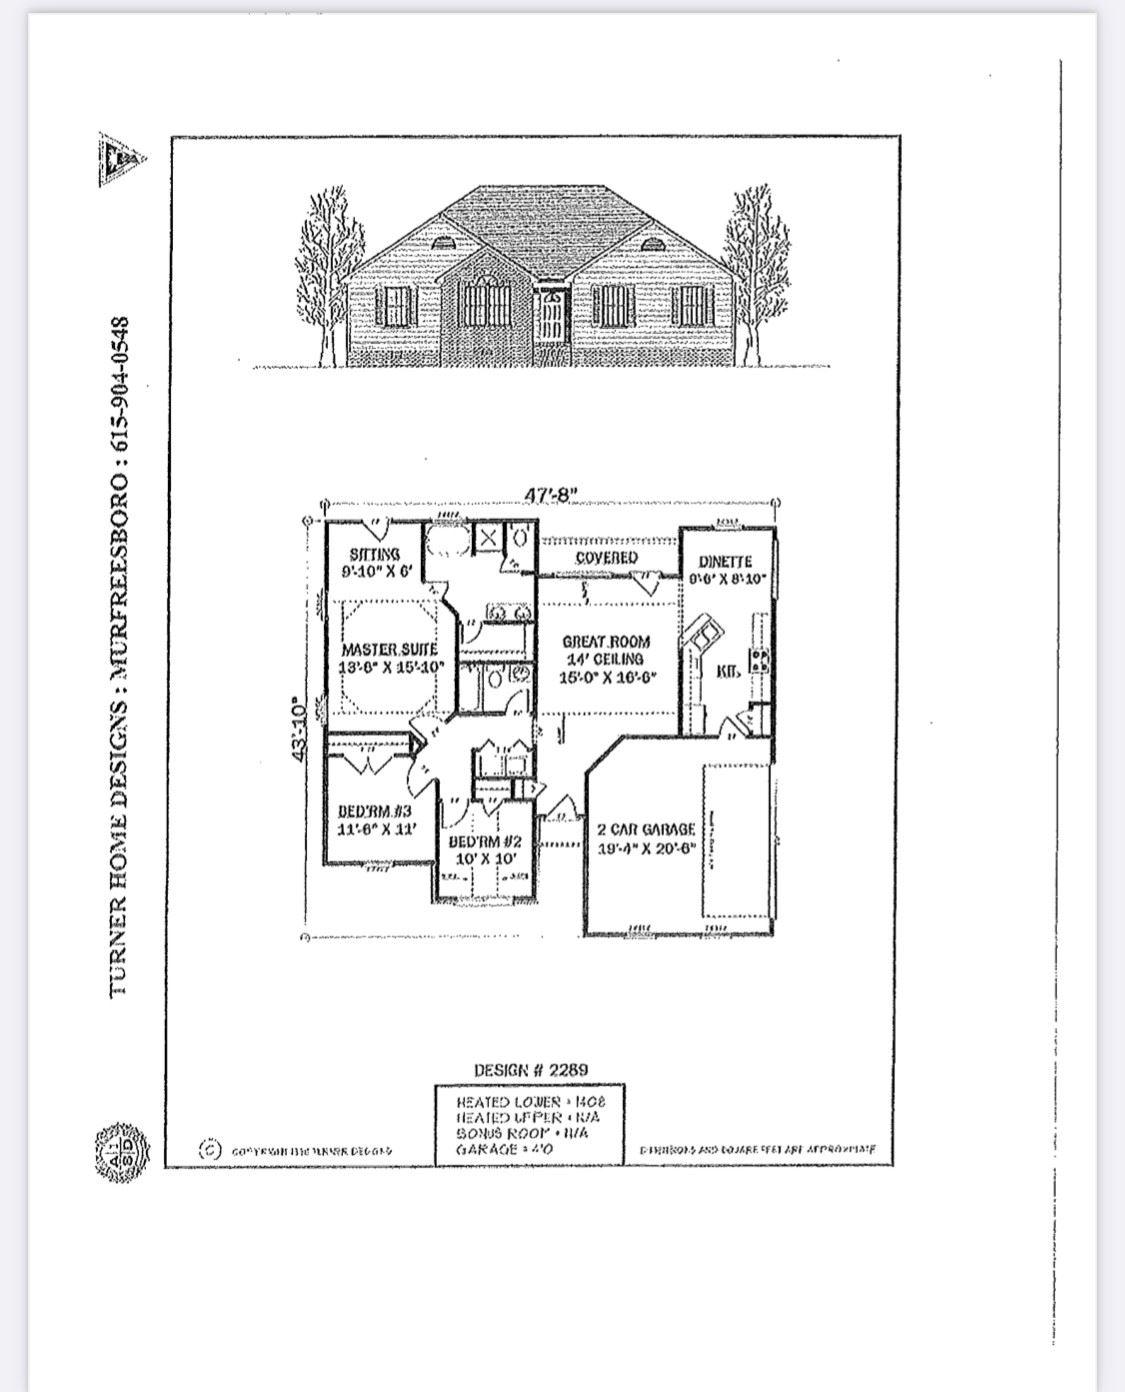 2743 Old Alto Hwy- Lot 82, Decherd, TN 37324 - MLS#: 2271874